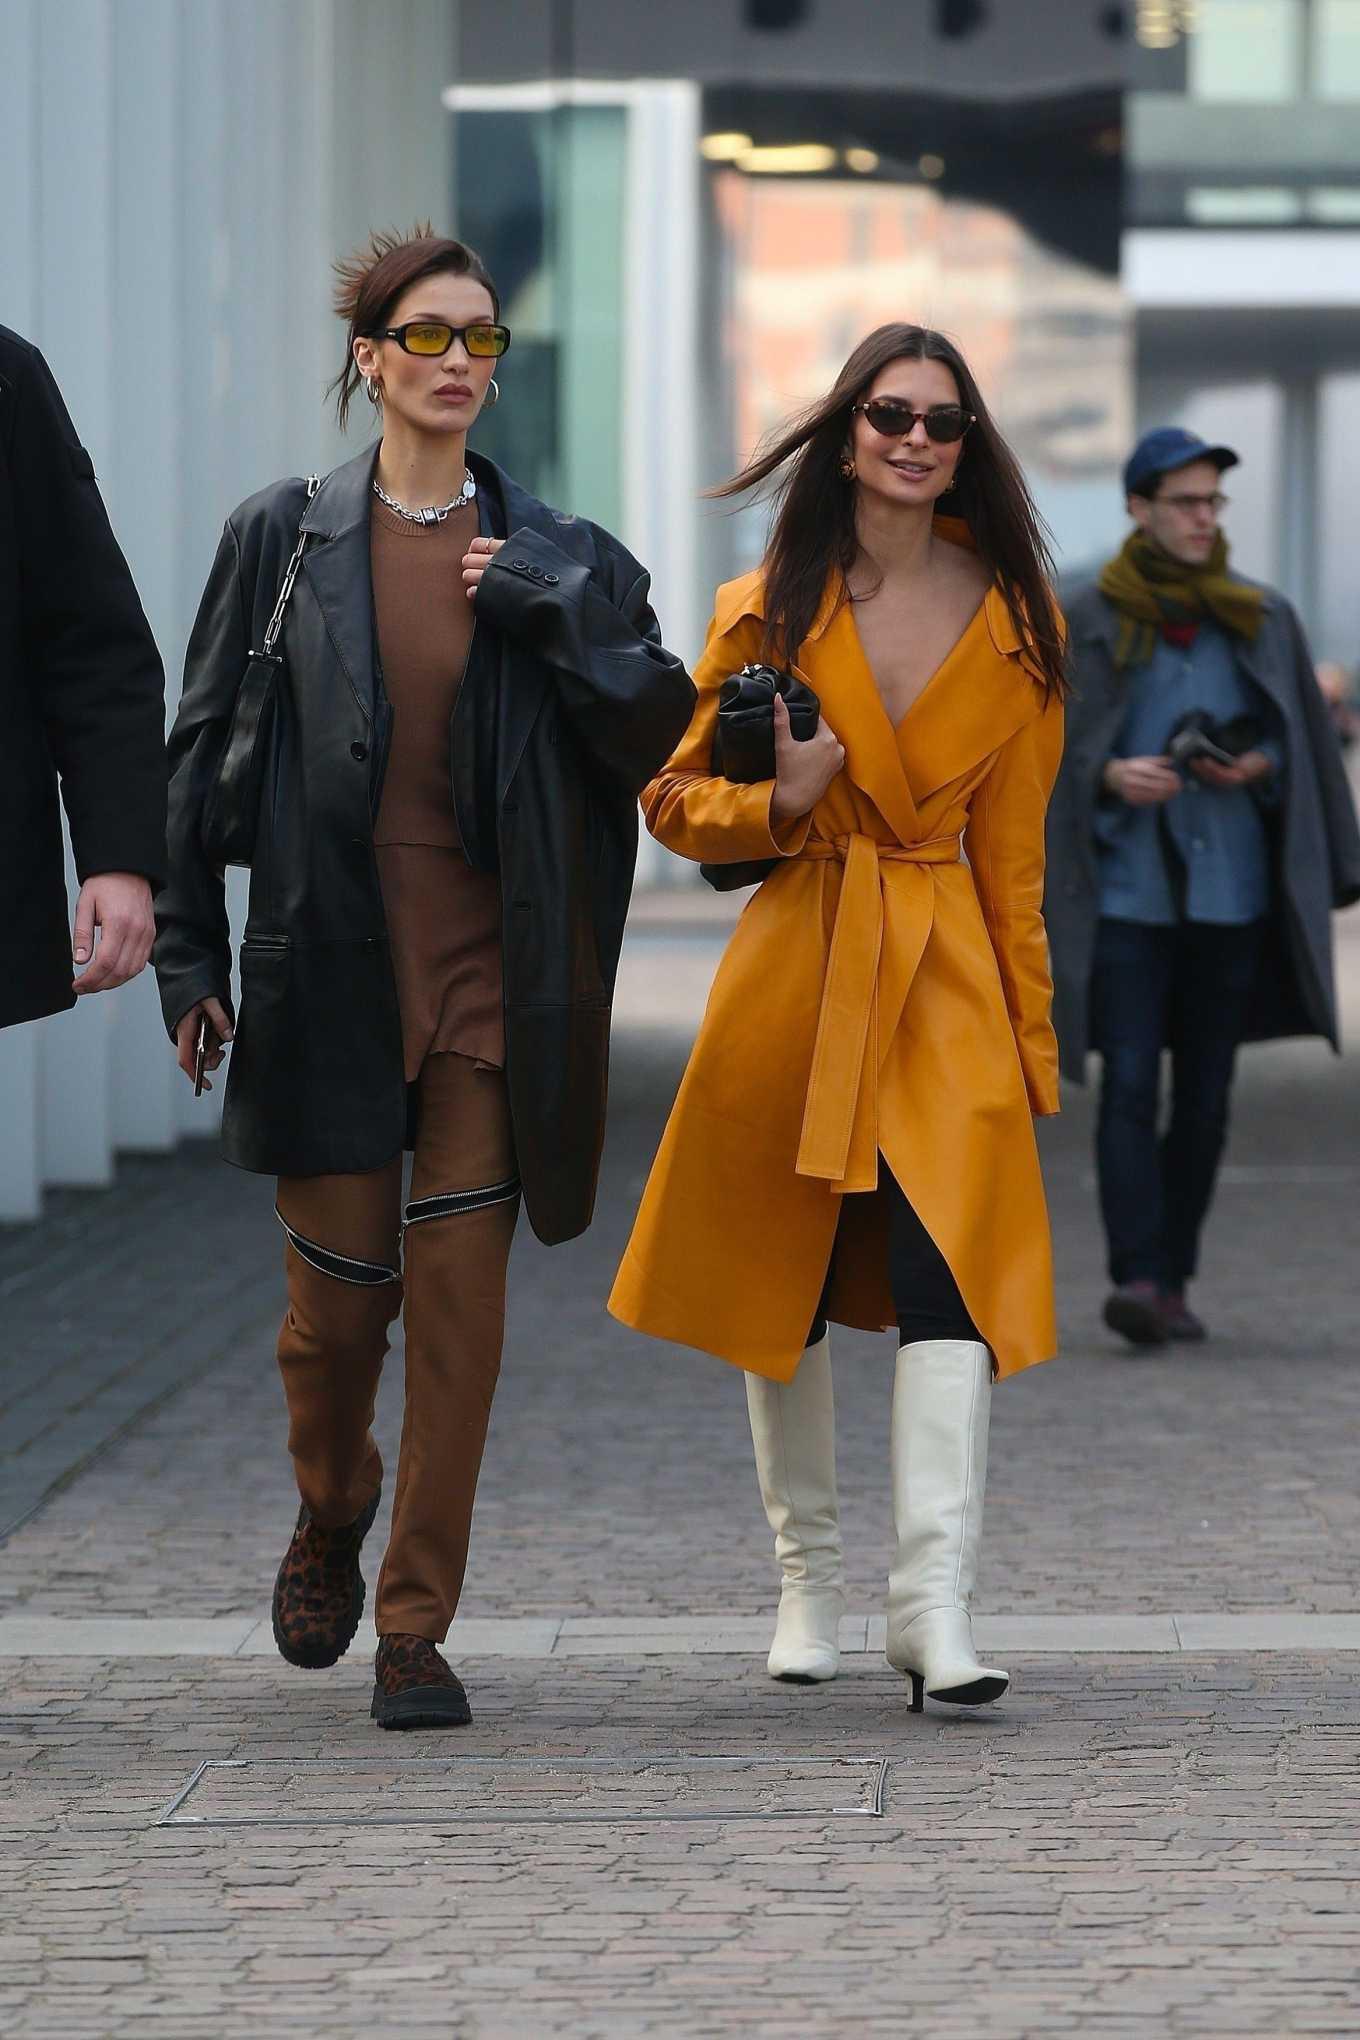 Emily Ratajkowski 2020 : Emily Ratajkowski and Bella Hadid visiting Fondazione Prada exhibition in Milan-03